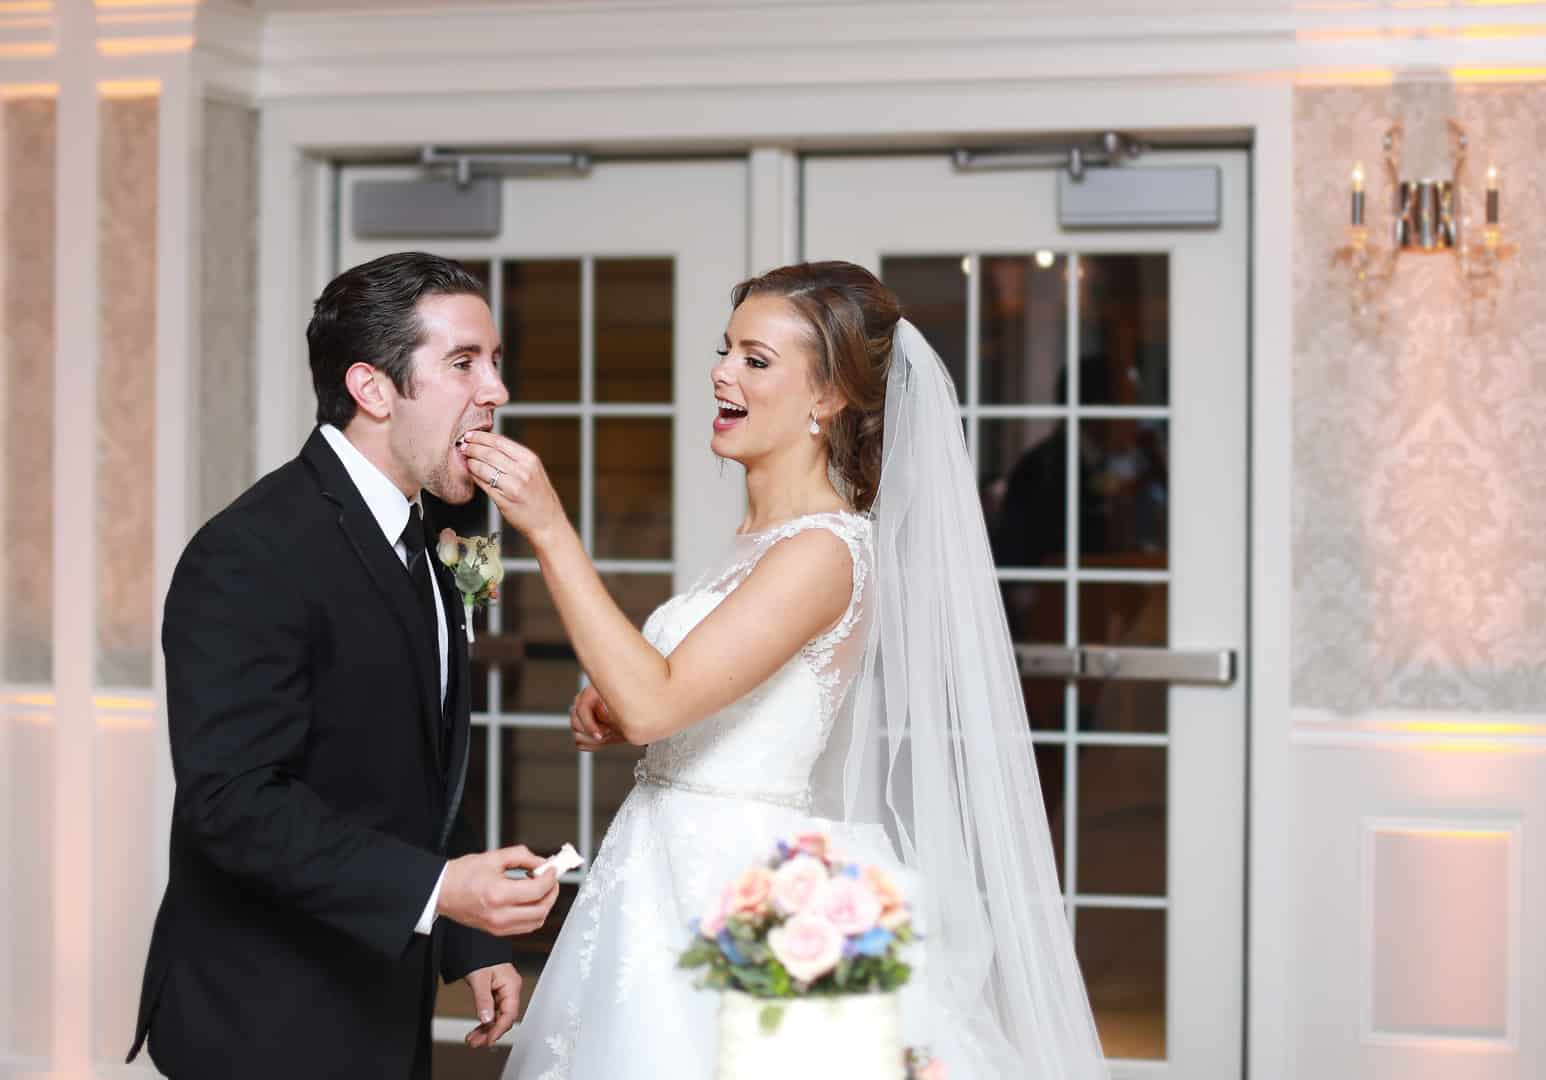 bride feeding the groom cake at reception